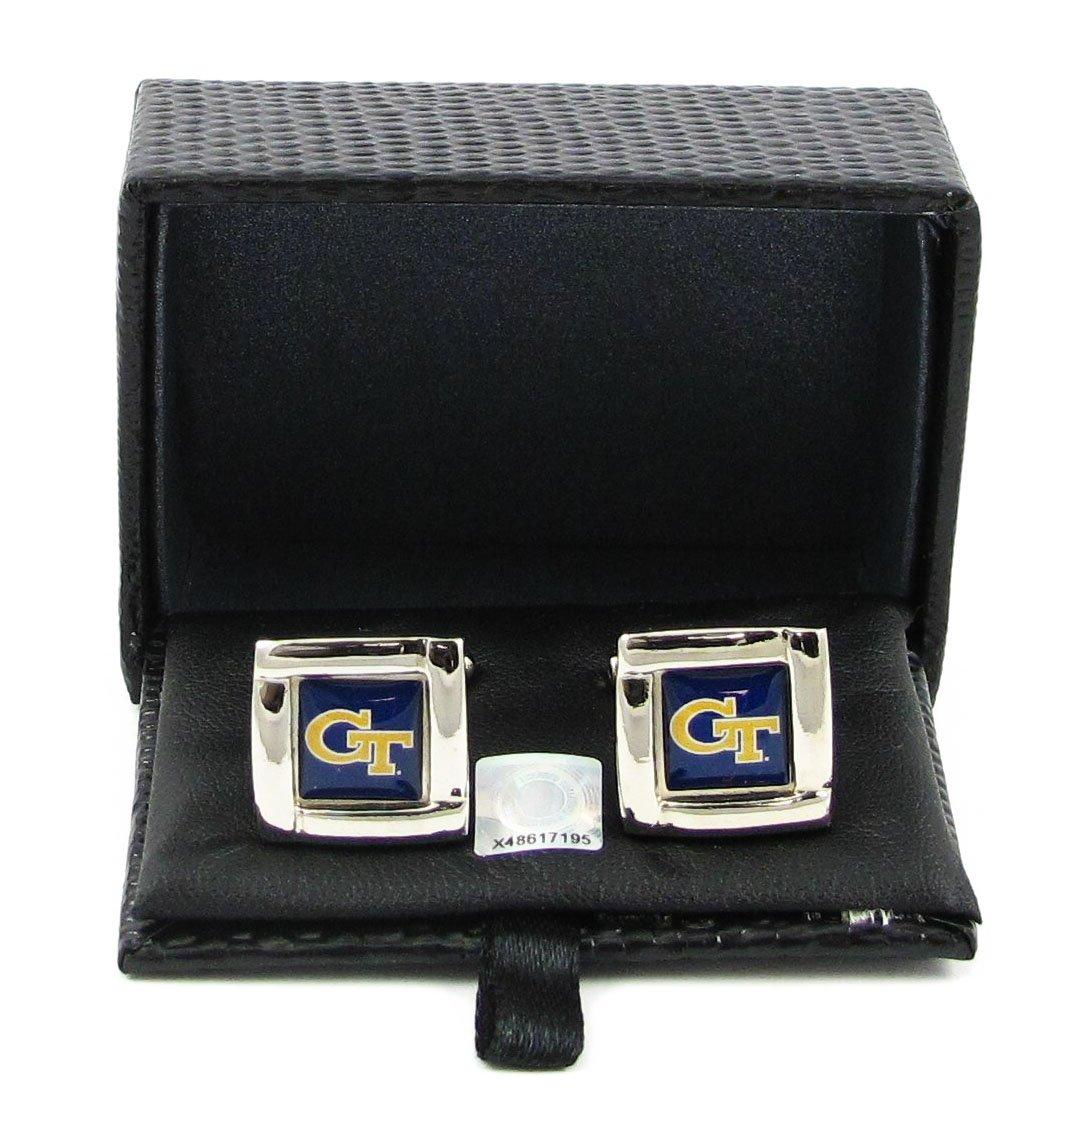 NCAA Georgia Tech Yellow Jackets Square Cufflinks With Square Shape Engraved Logo Design Gift Box Set